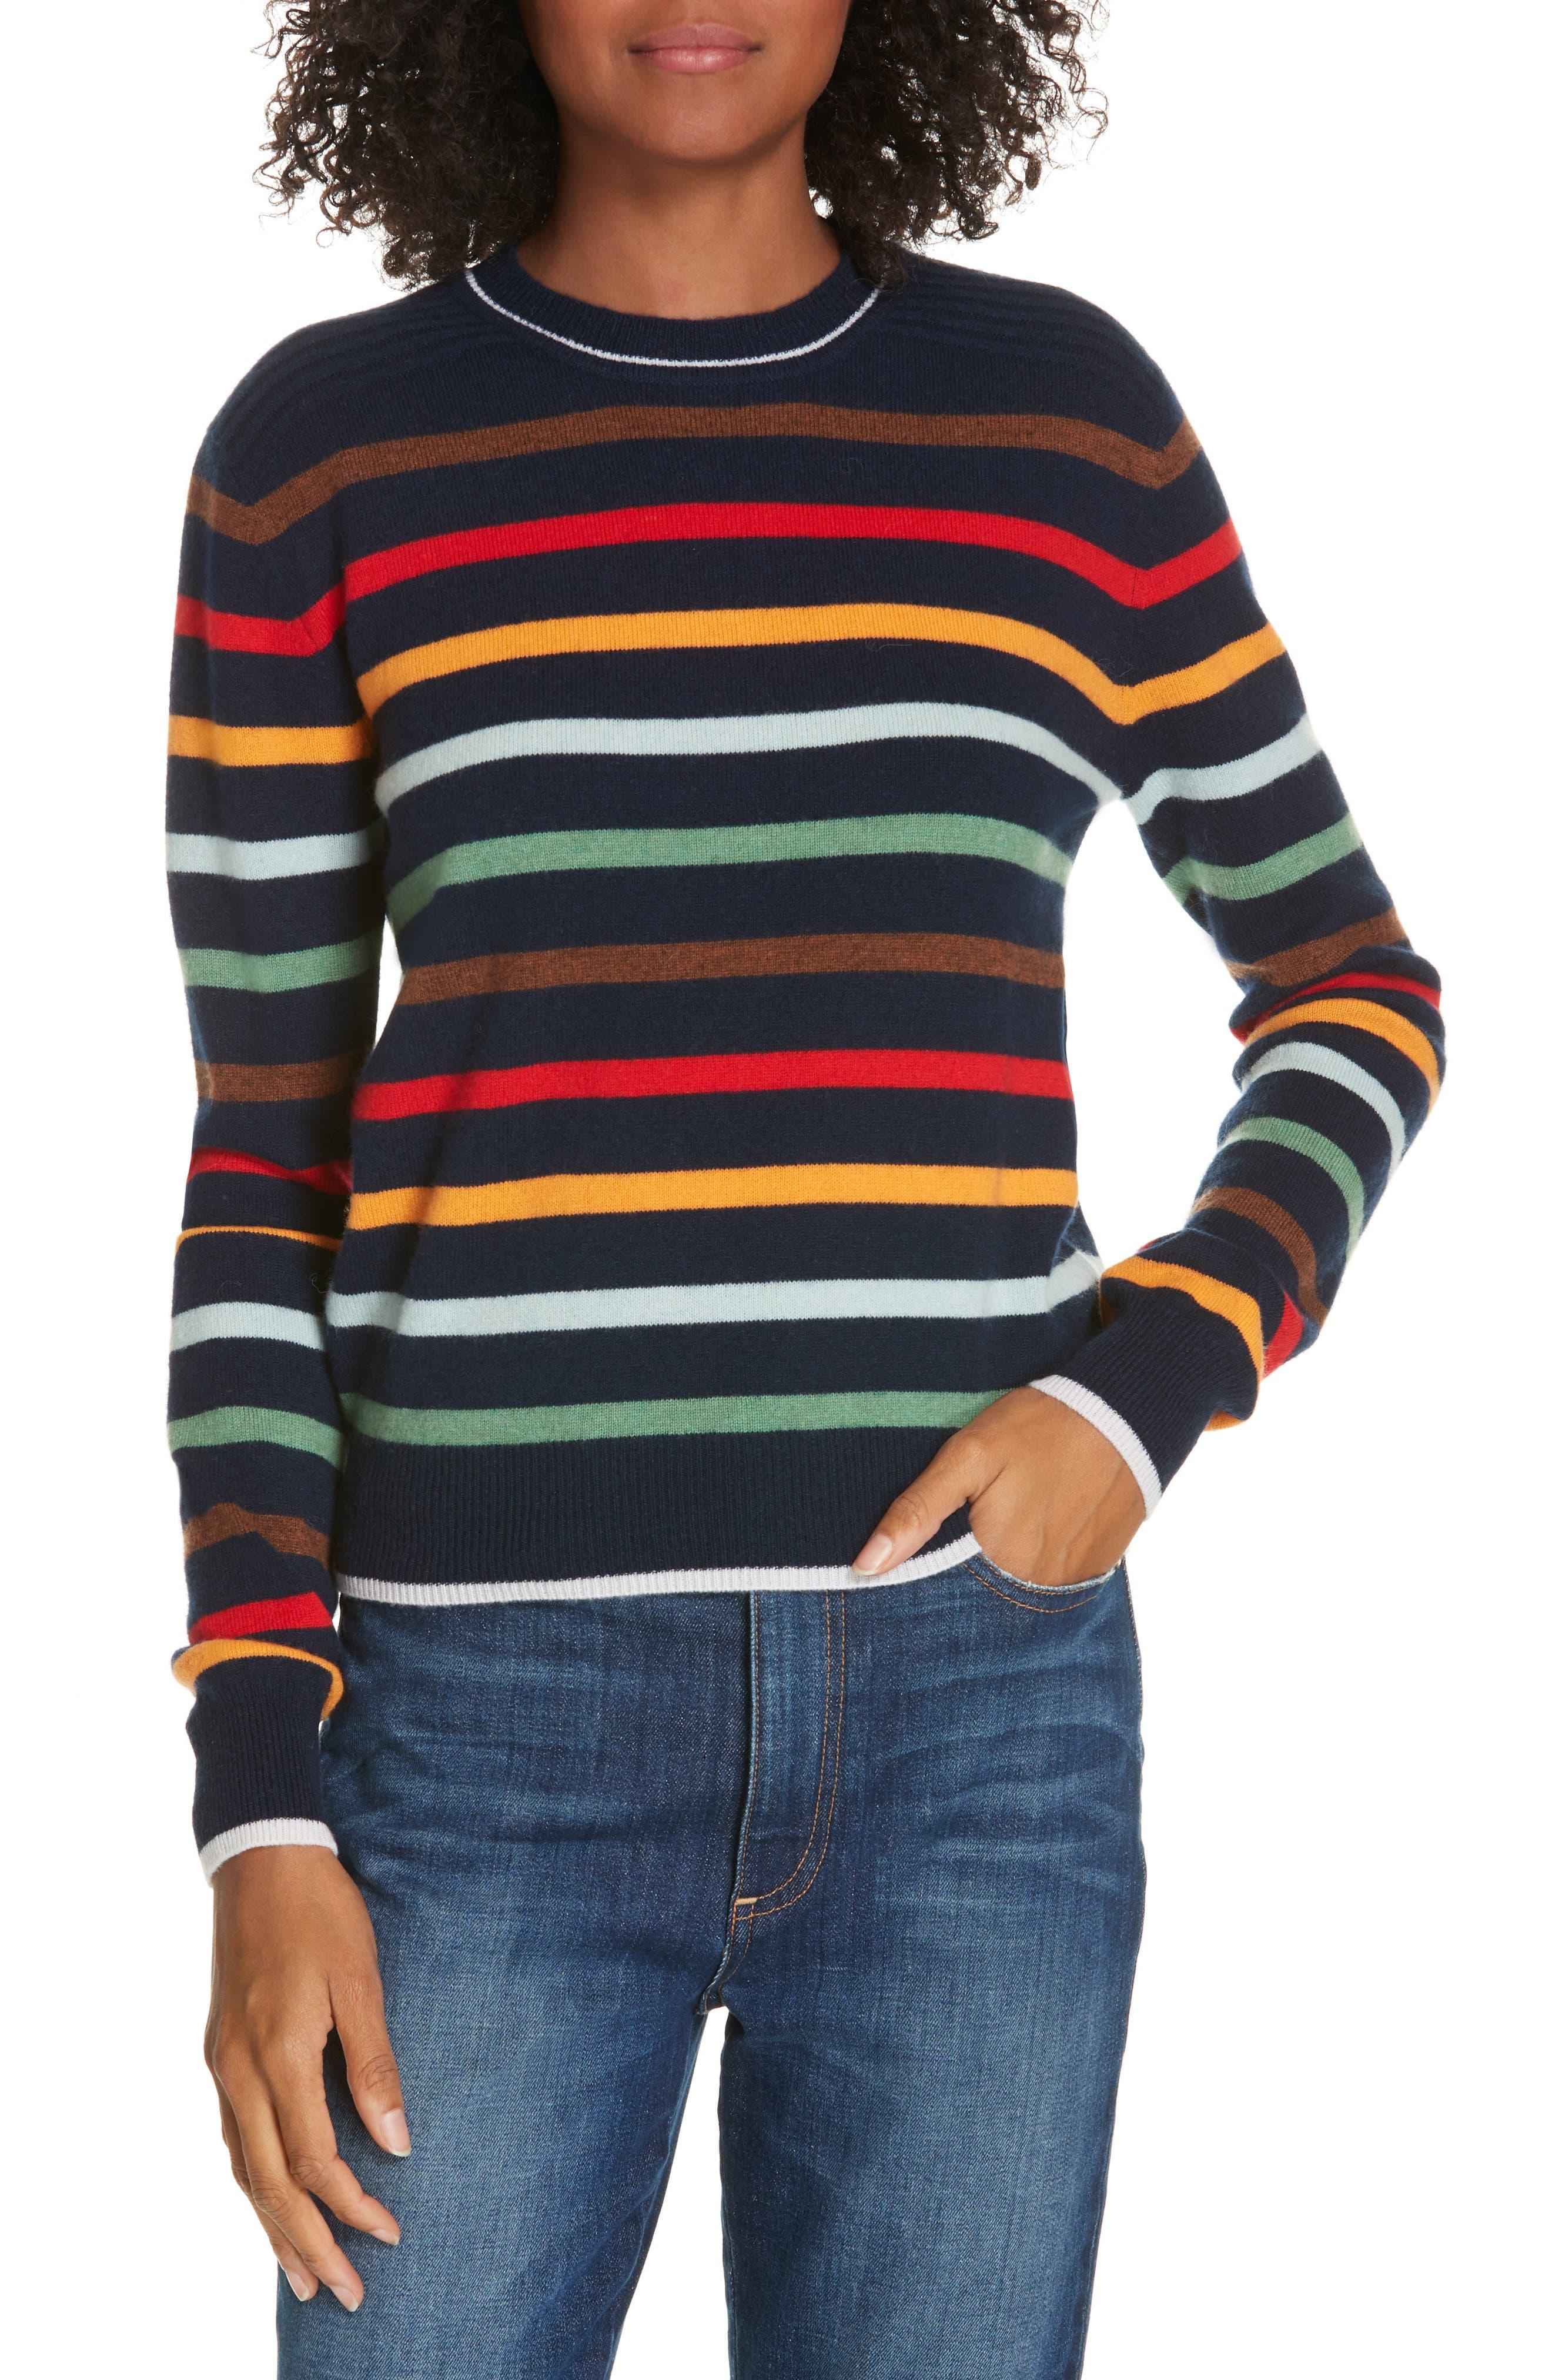 Rainbow Neat Wool & Cashmere Sweater,                             Main thumbnail 1, color,                             NAVY/ RAINBOW